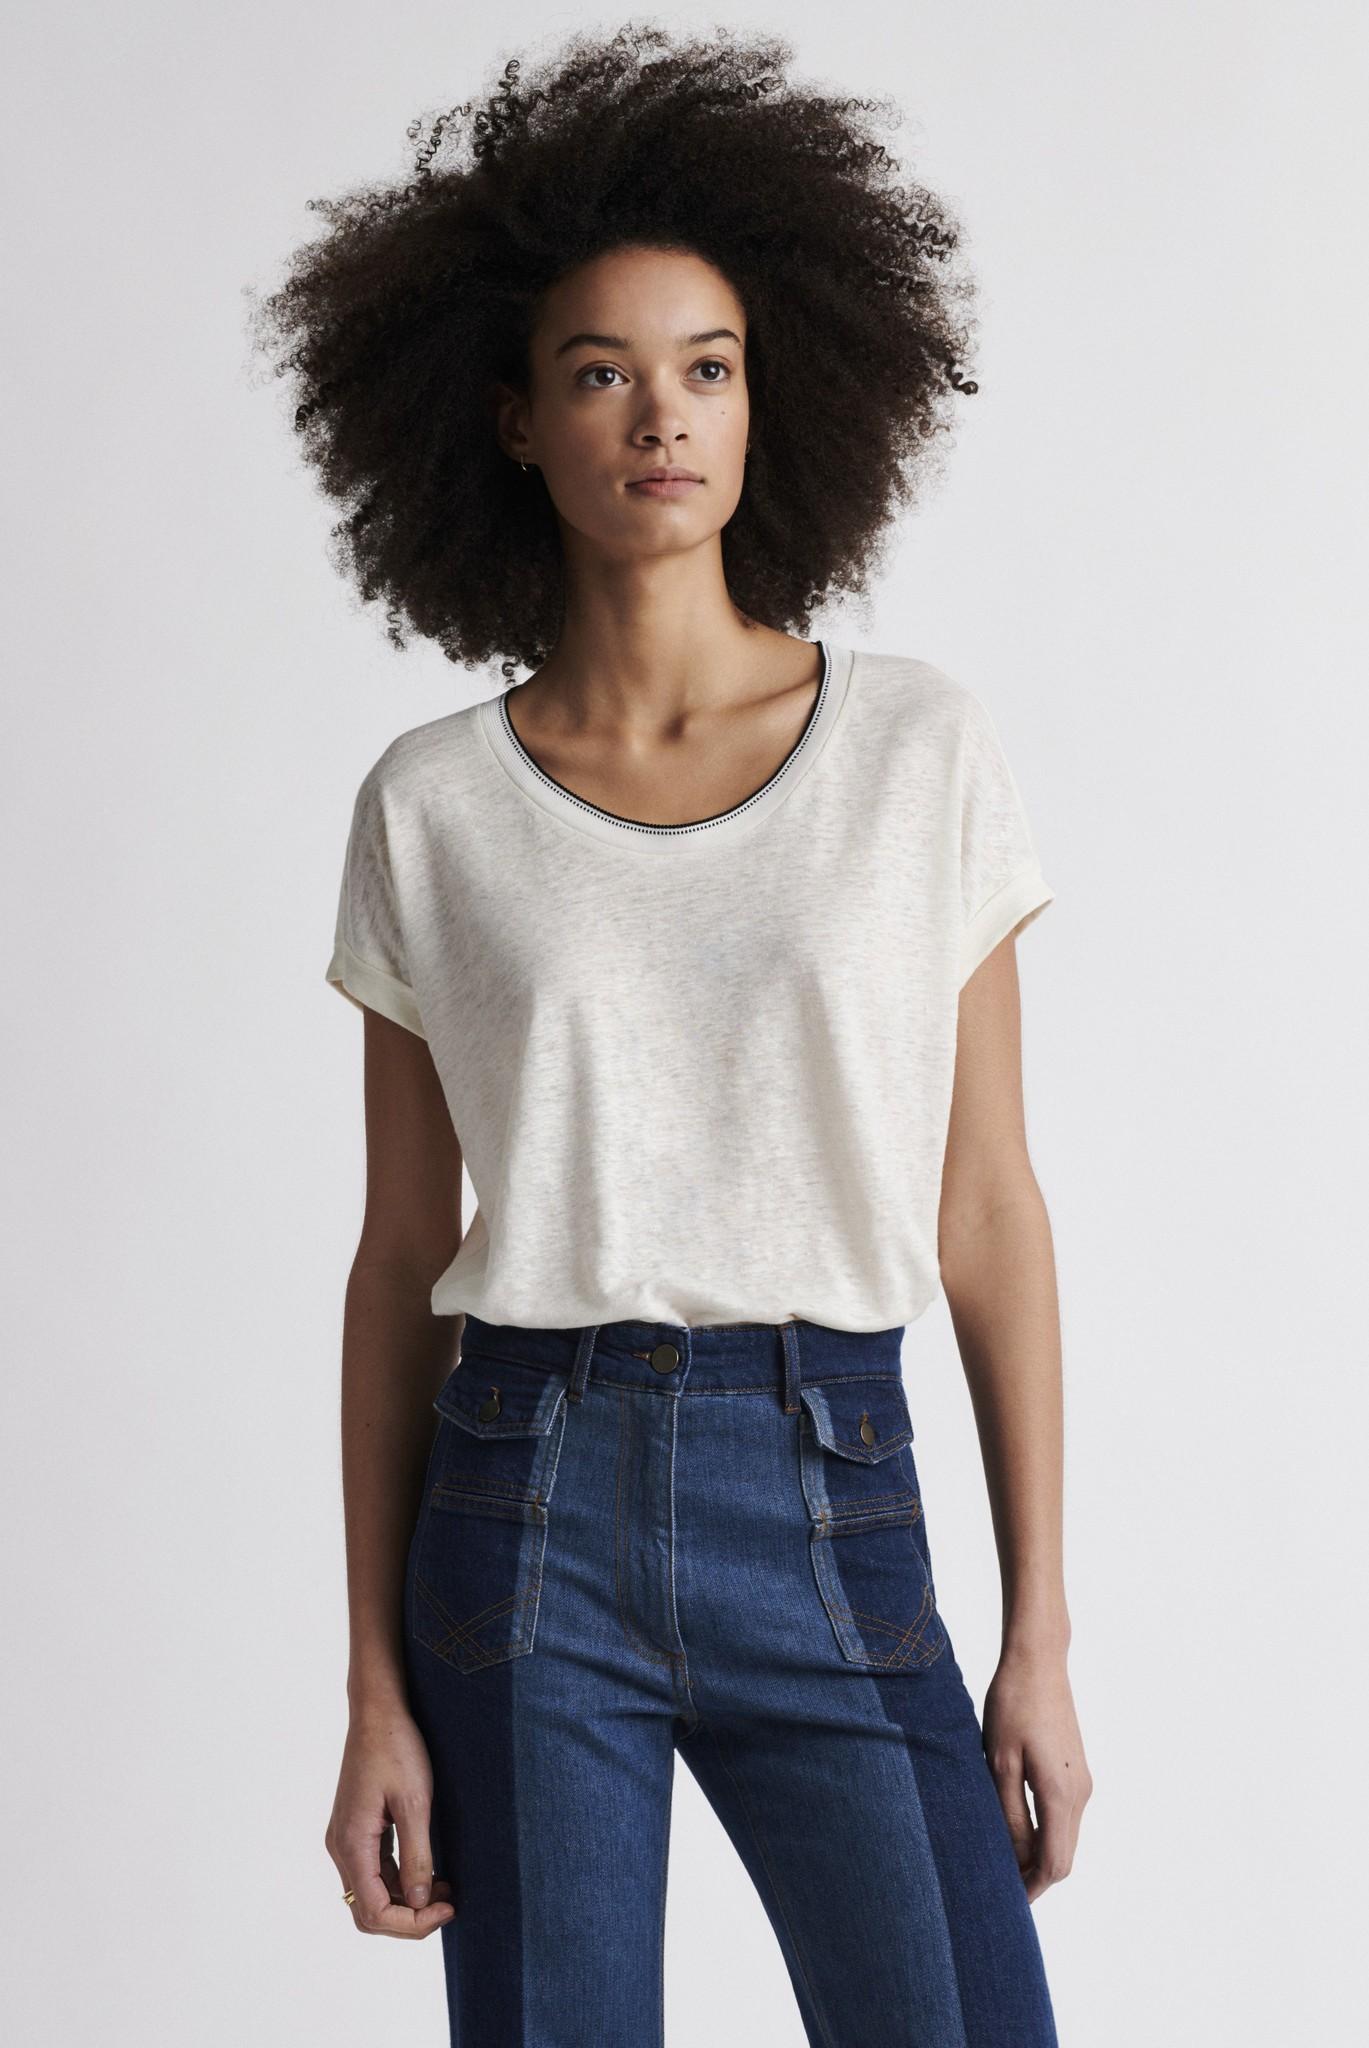 JEMMA - Свободная льняная футболка